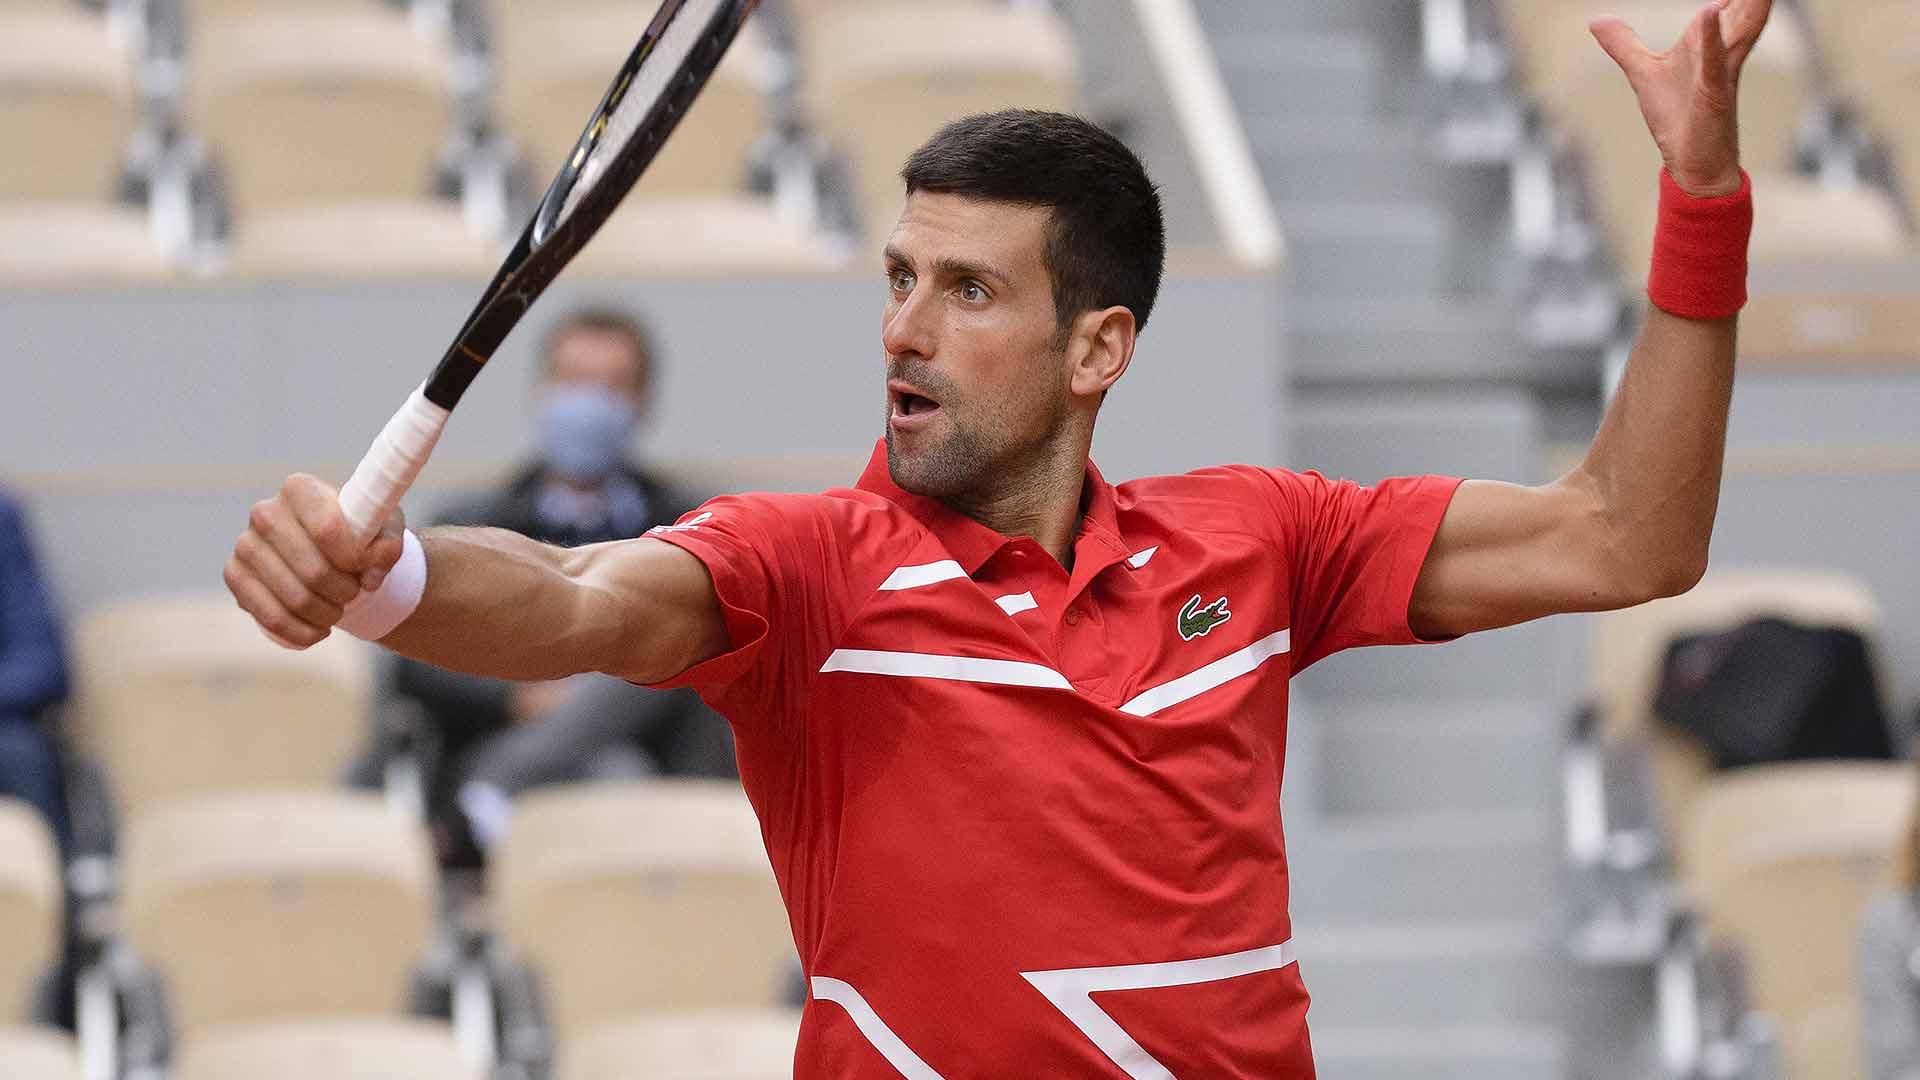 Very Awkward Deja Vu Says Djokovic After Accidentally Hitting Linesman French Open Love Tennis